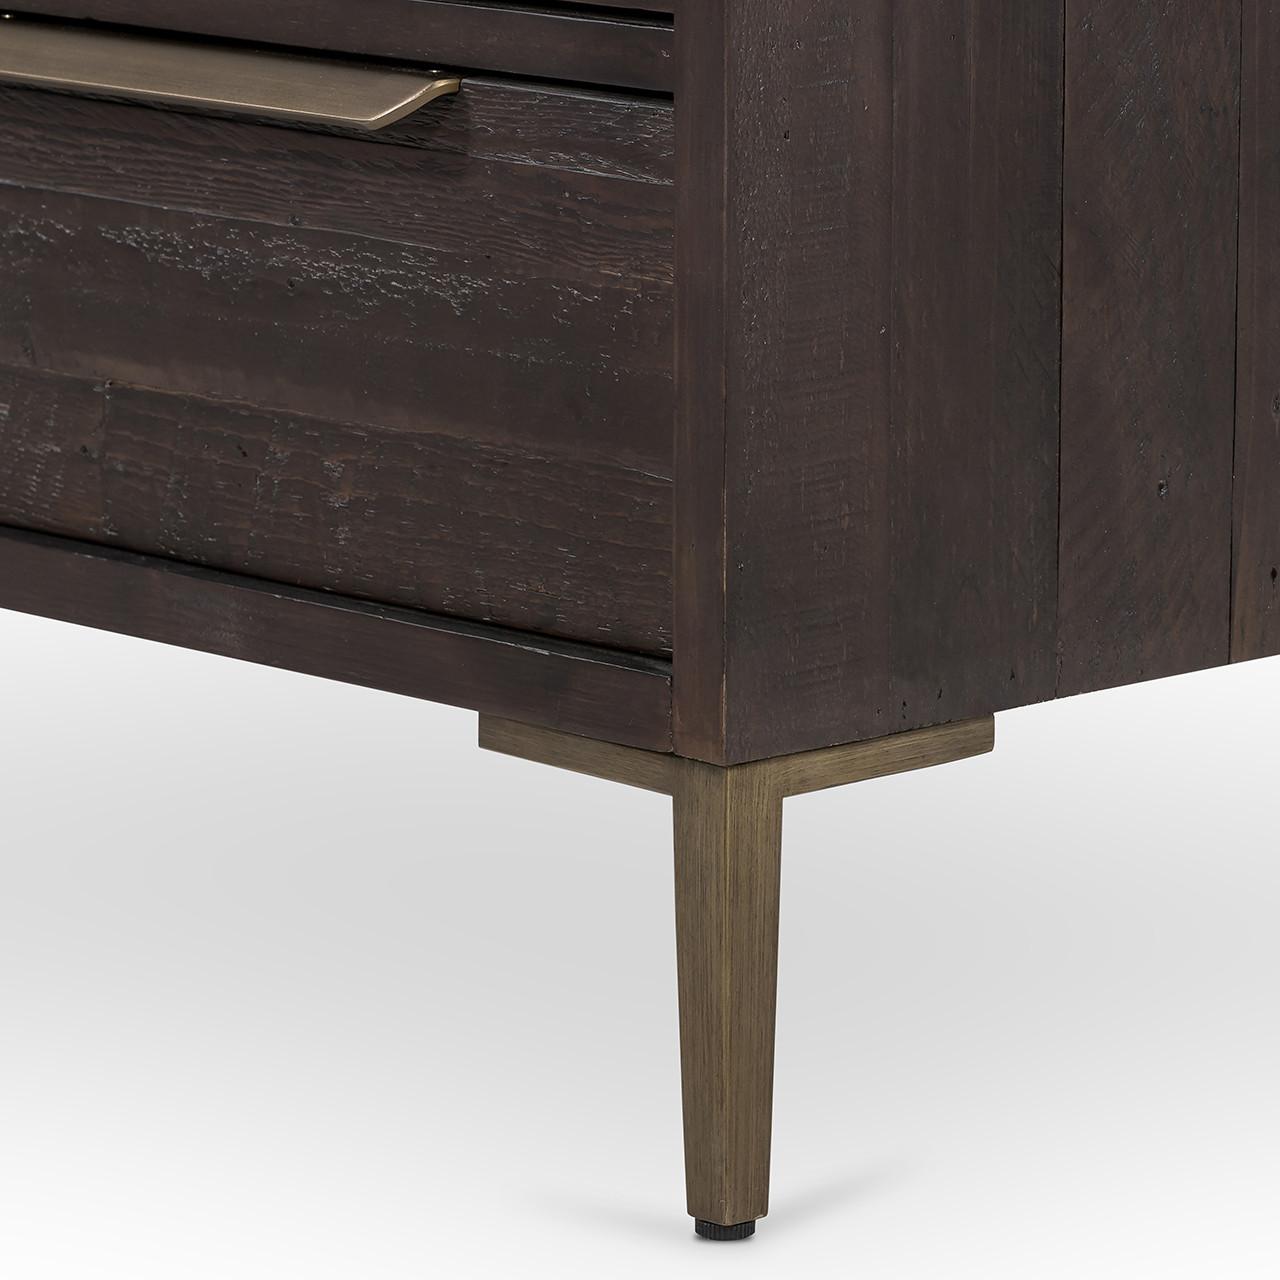 Wyeth 6 Drawer Dresser - Dark Carbon